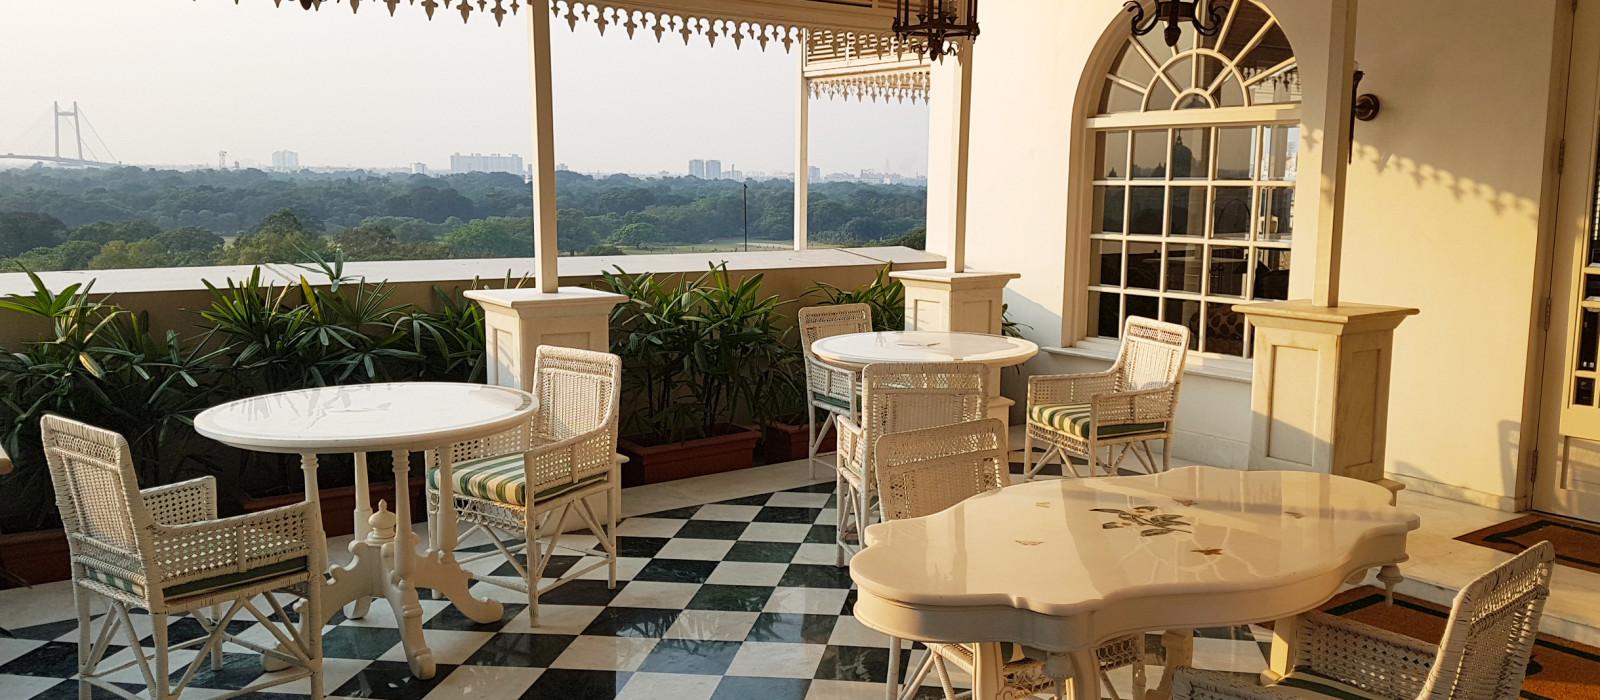 Hotel Glenburn Pent House Ostindien